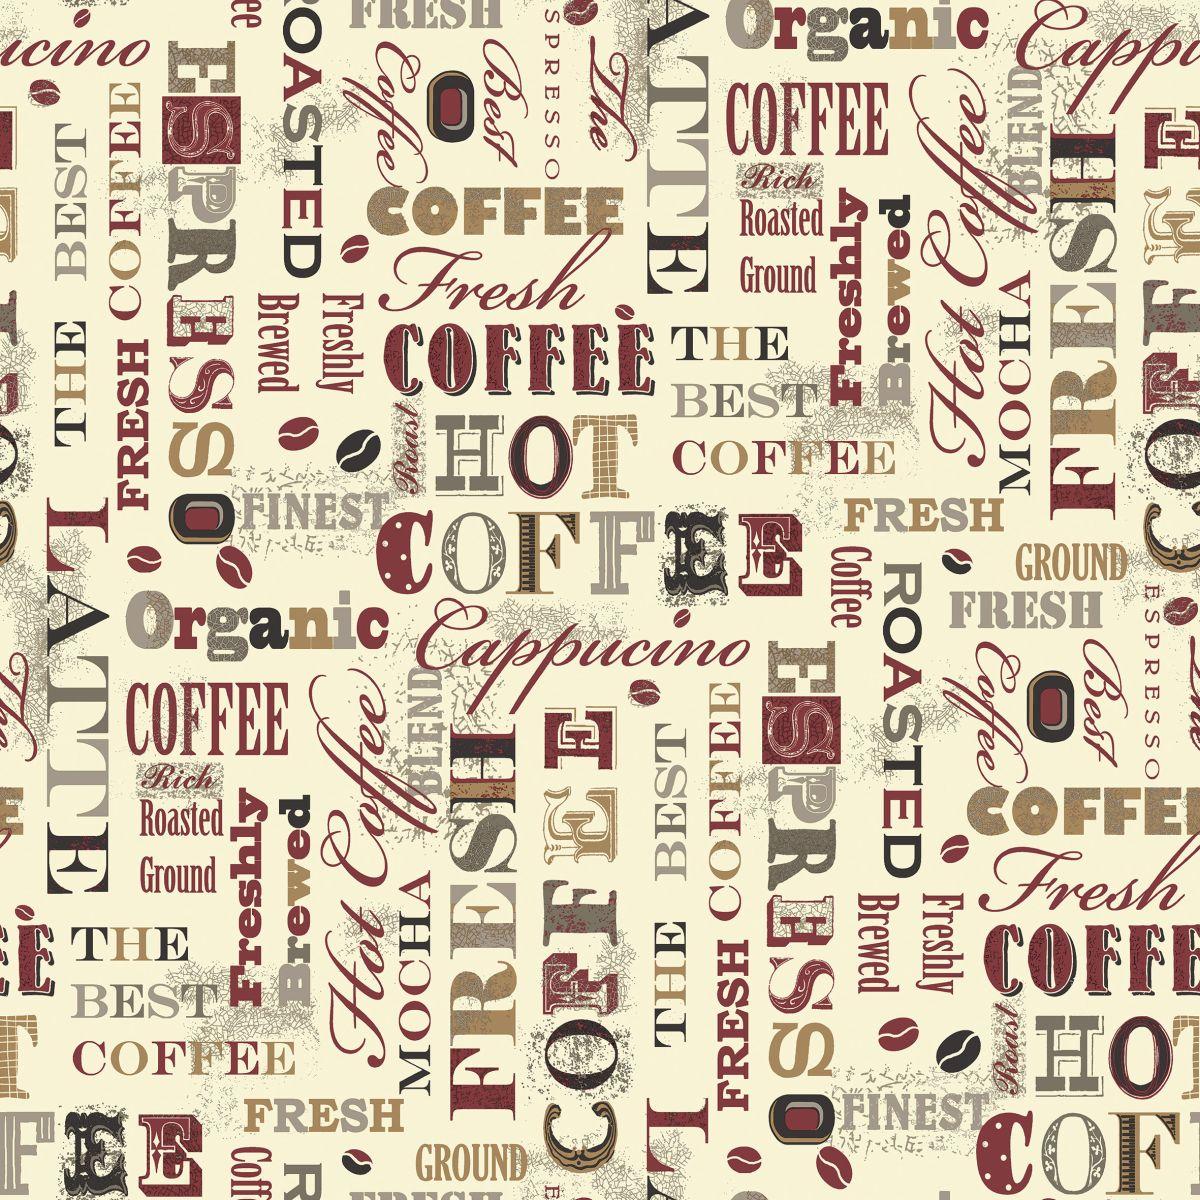 Non Woven Vinyl Wallpaper With Coffee Motifs G12053 Kitchen Recipes Decowunder Tapeten De